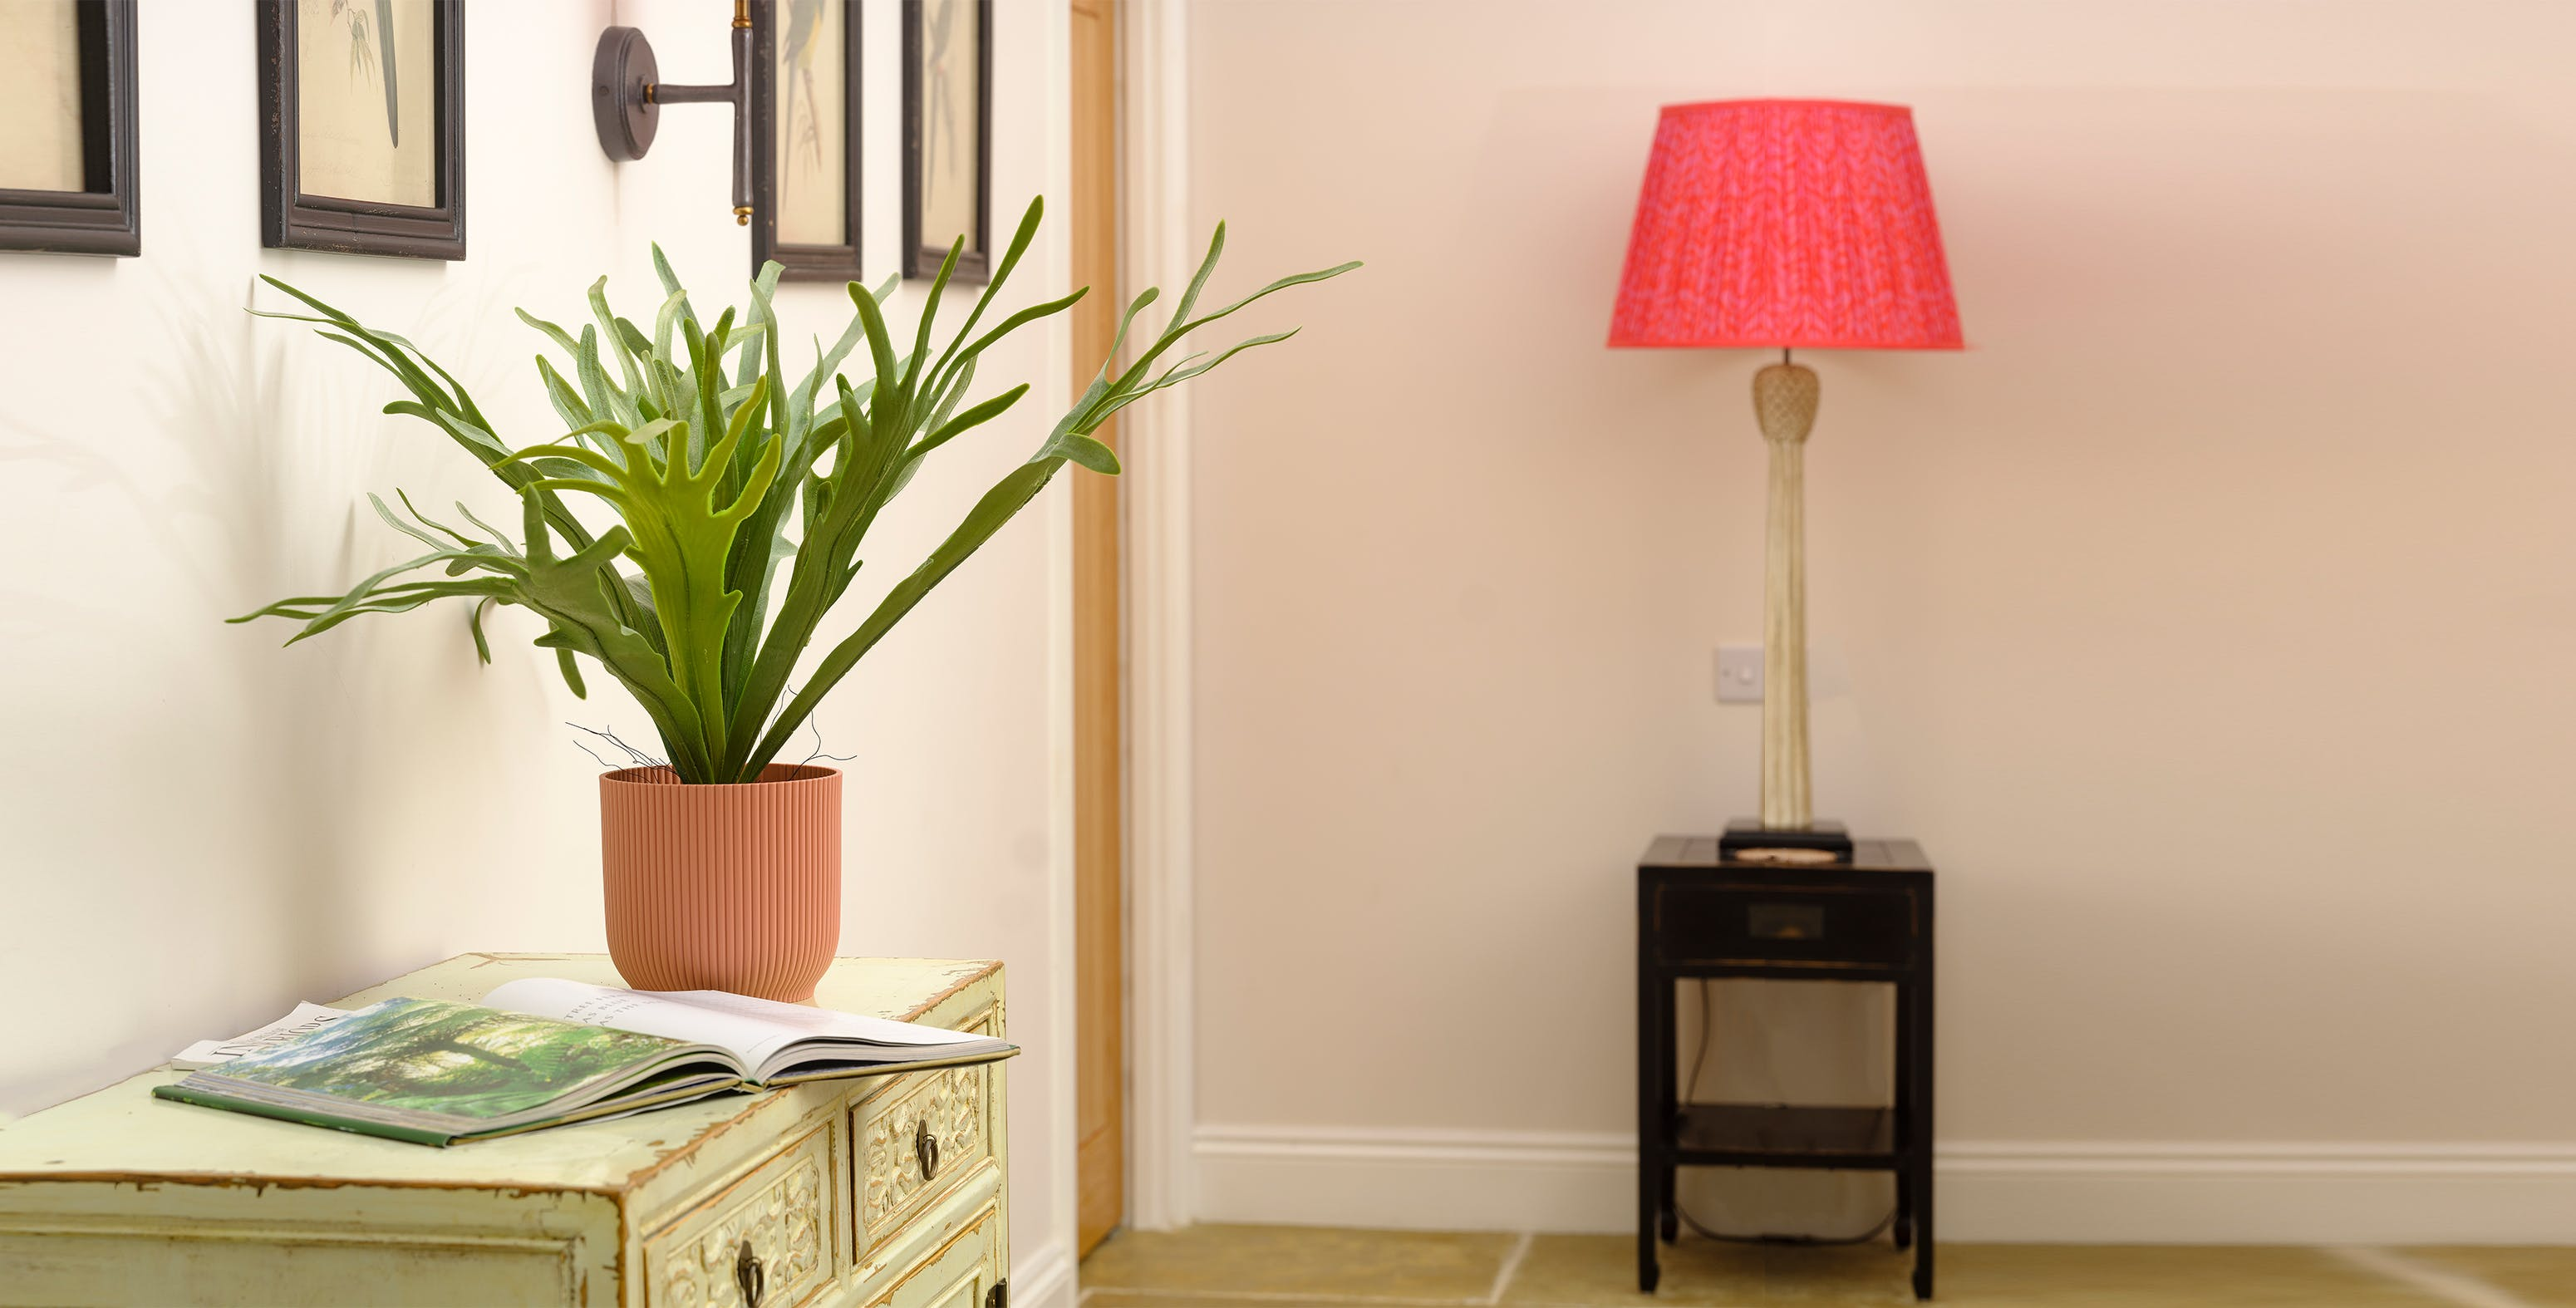 Artificial staghorn fern on sideboard in bedroom